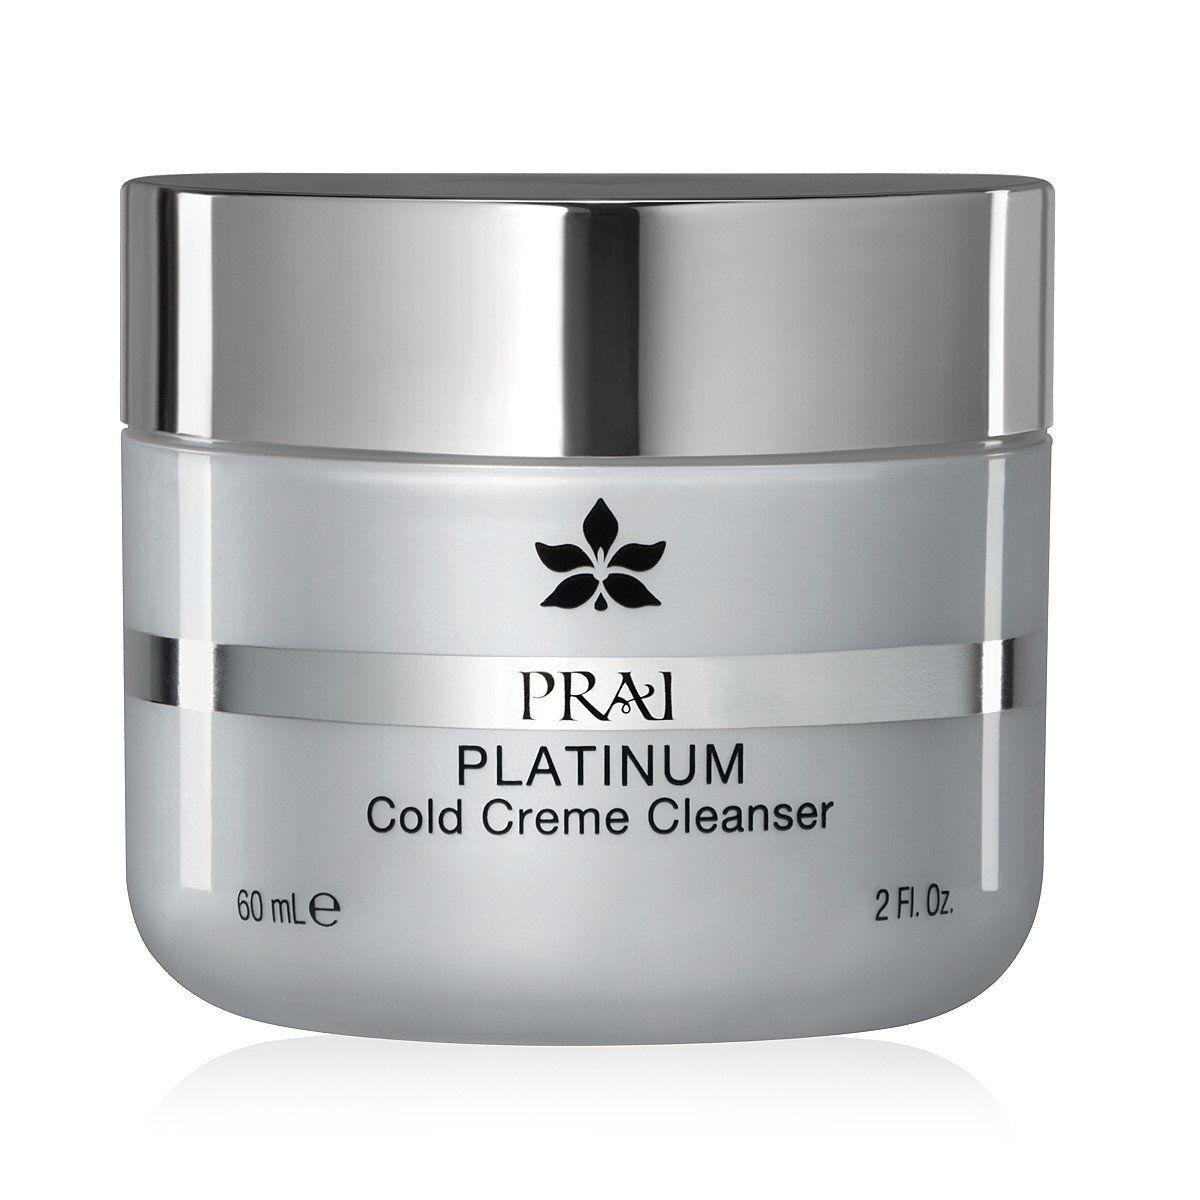 Prai Beauty Platinum Cold Creme Cleanser